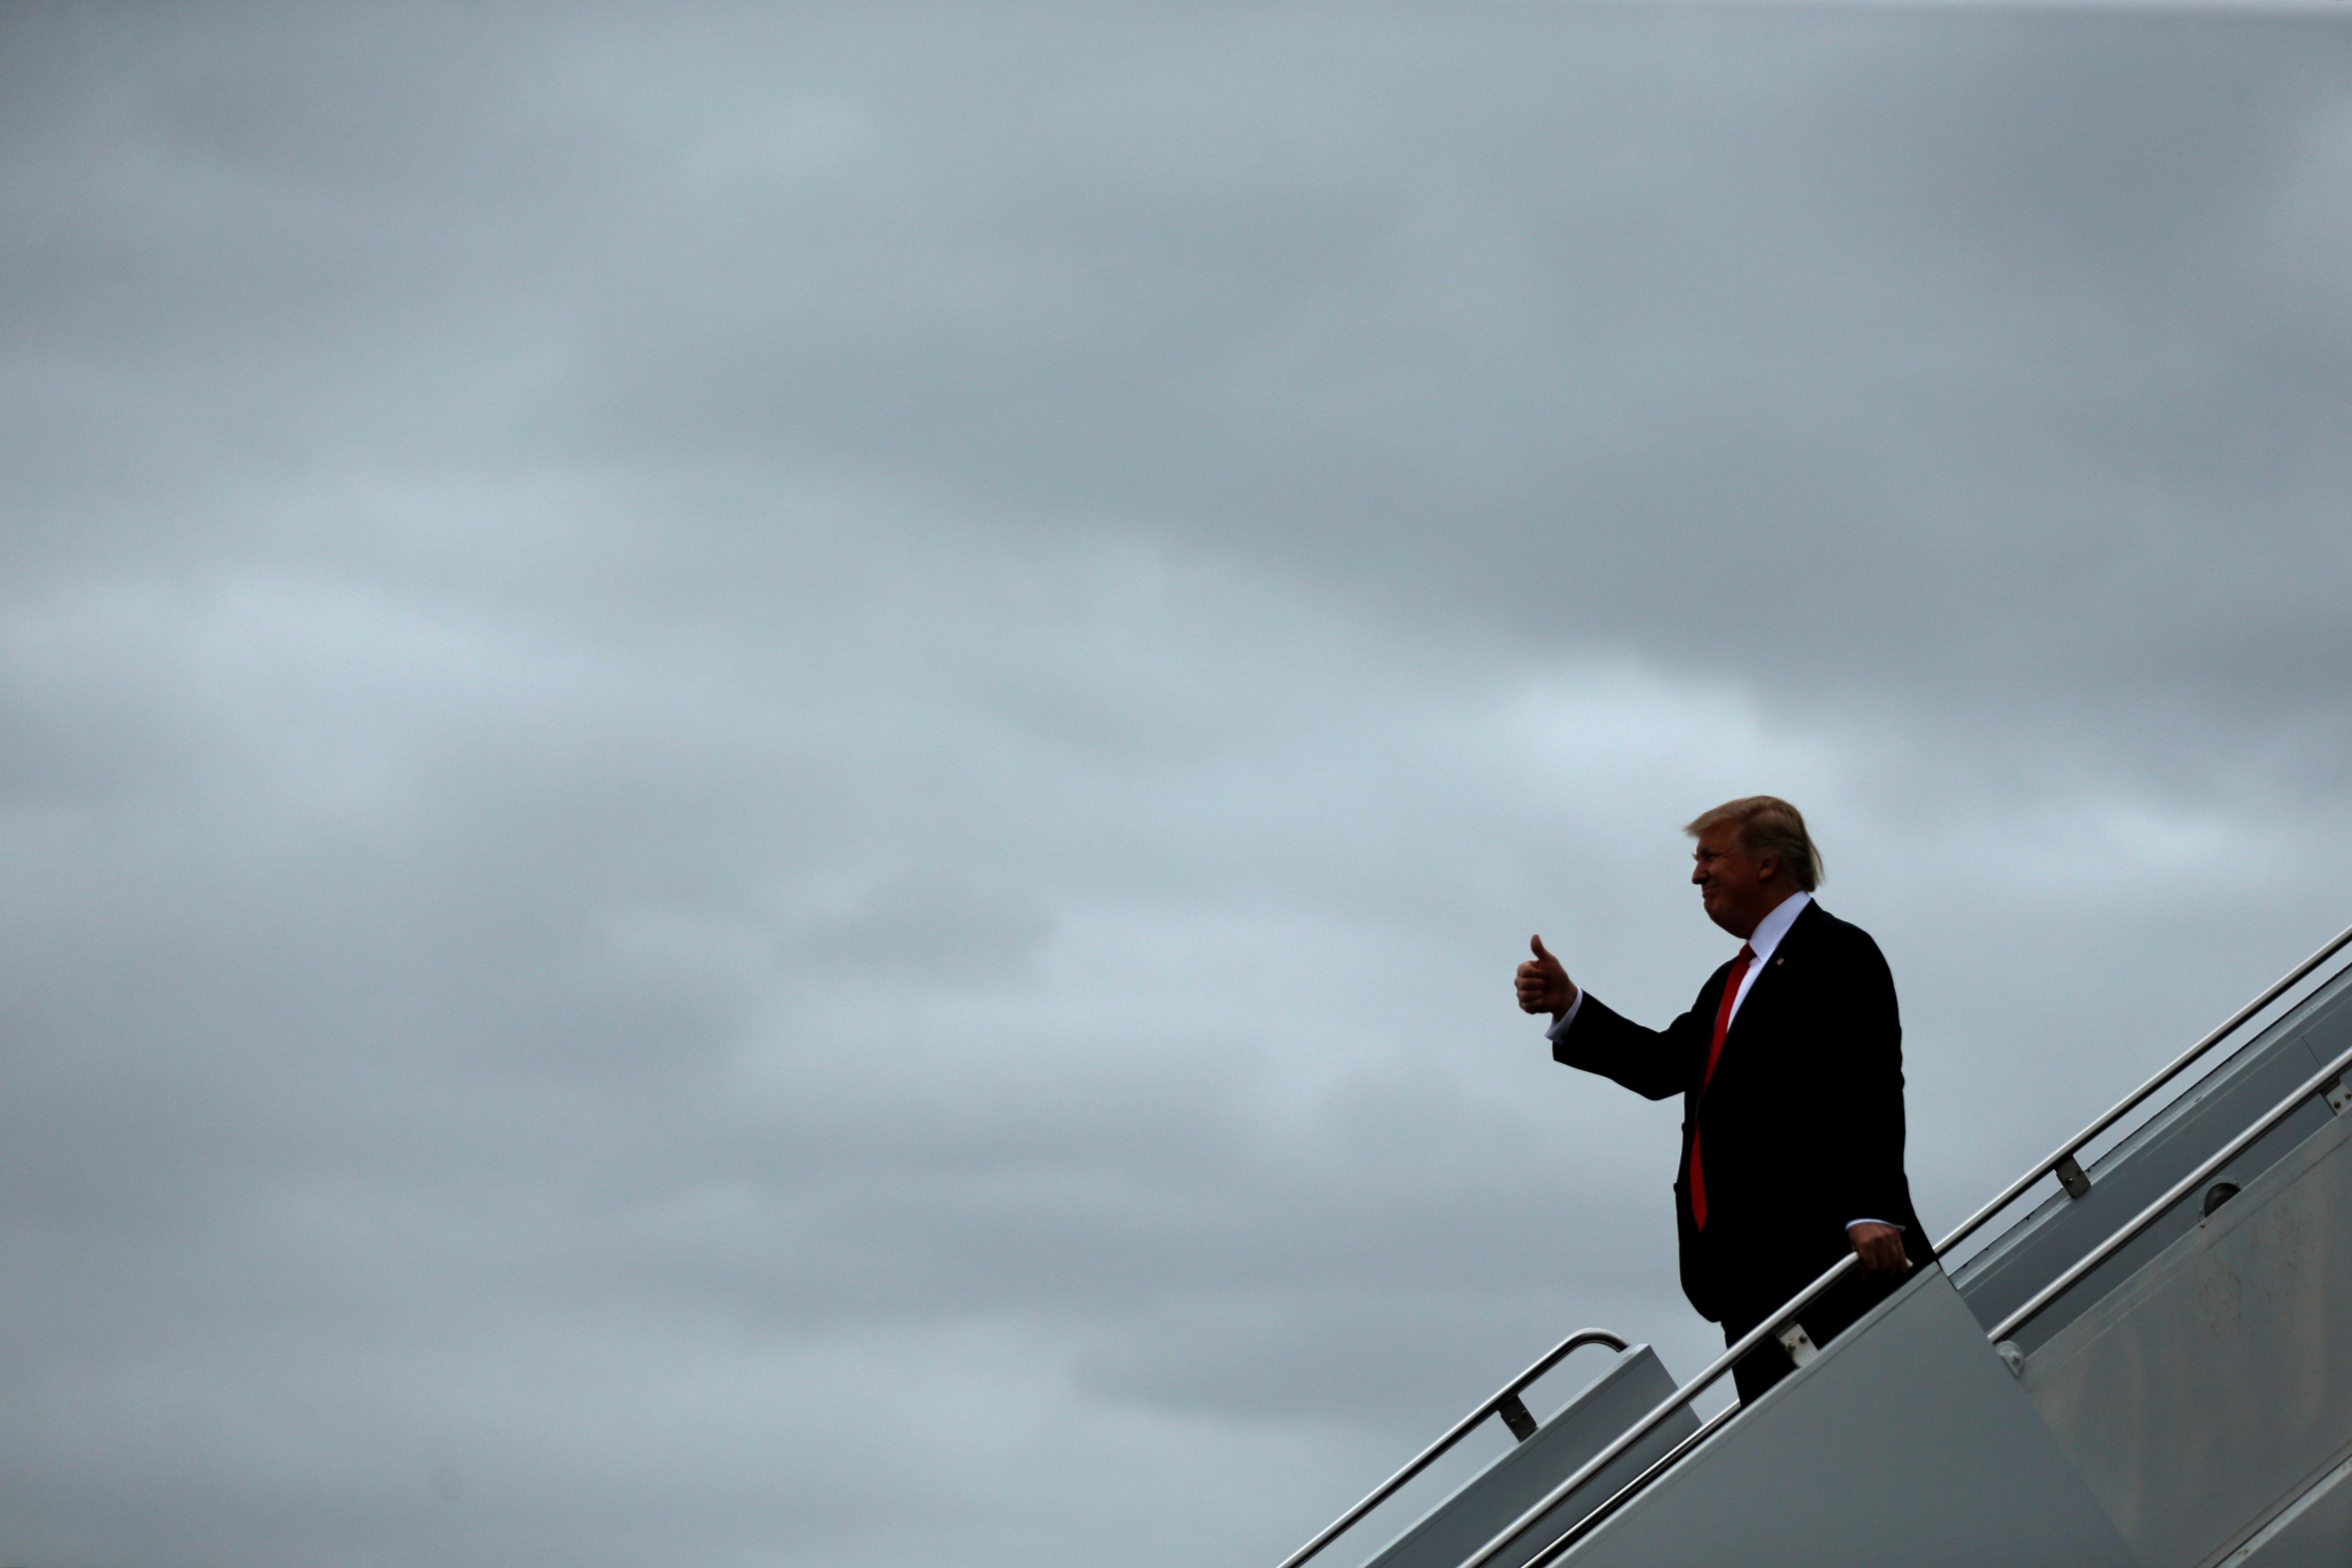 U.S. President Donald Trump arrives aboard Air Force One at Palm Beach International Airport in West Palm Beach, Florida, U.S